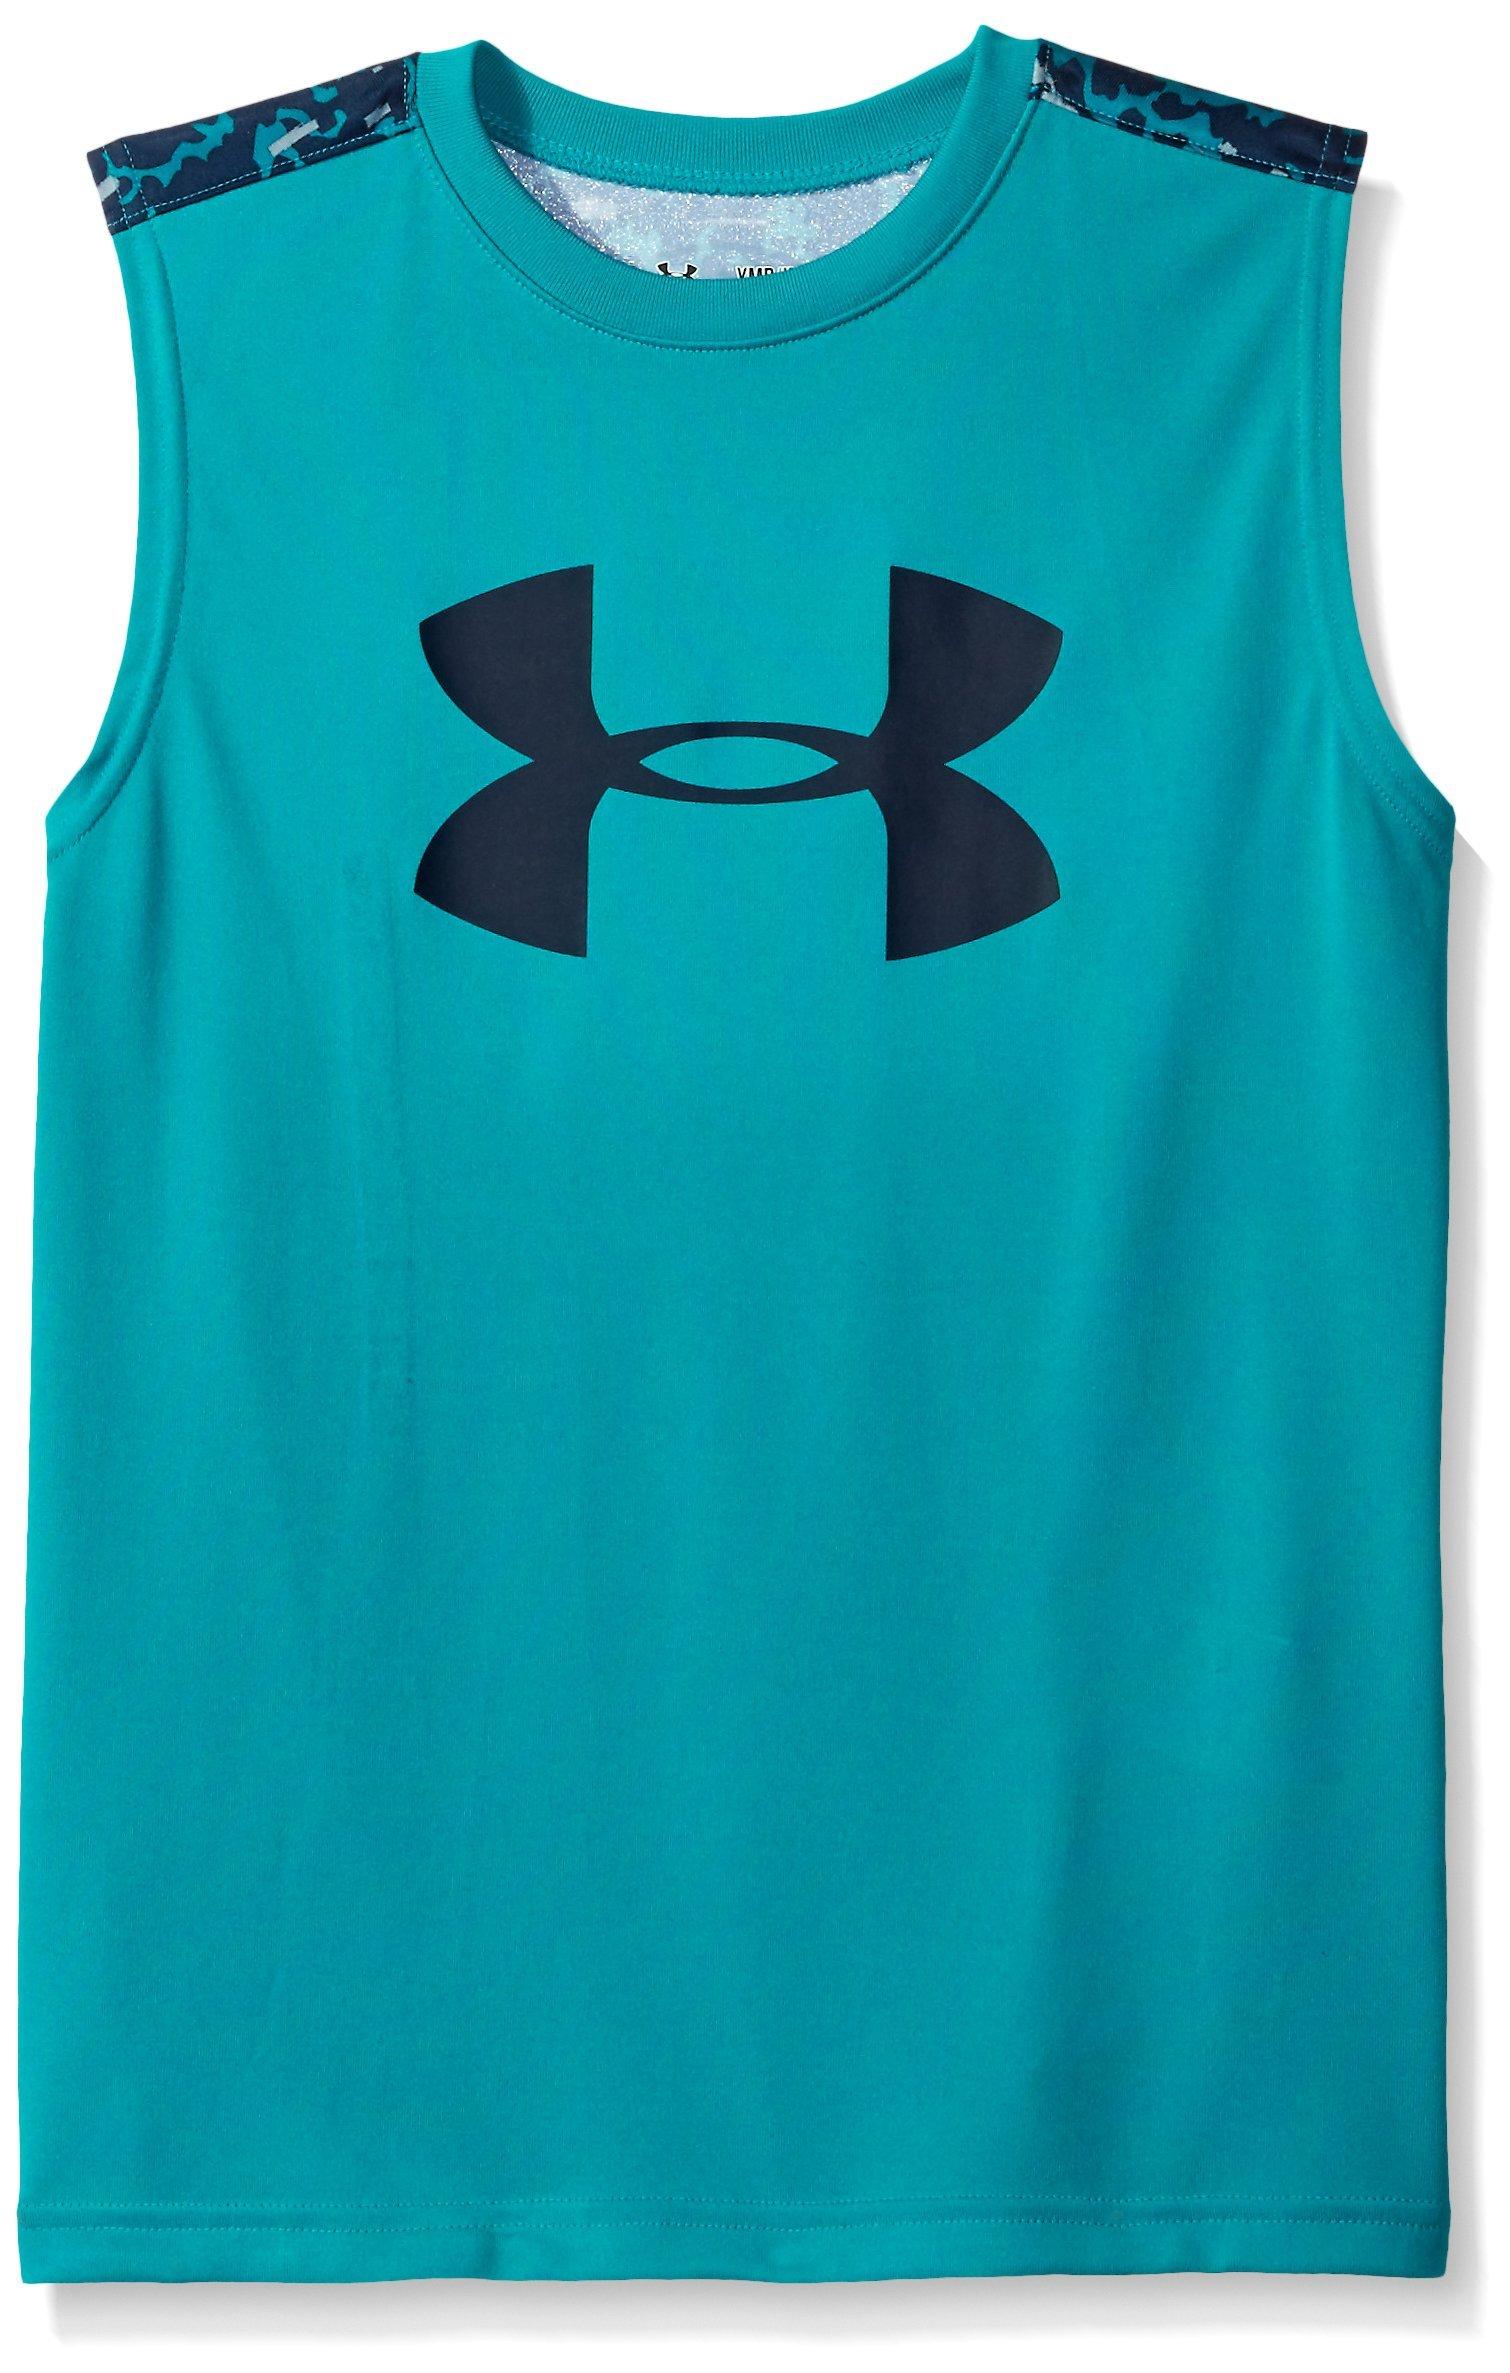 Under Armour Boys' Tech Big Logo Novelty Sleeveless T-Shirt, Tahitian Teal /Navy Seal, Youth Large